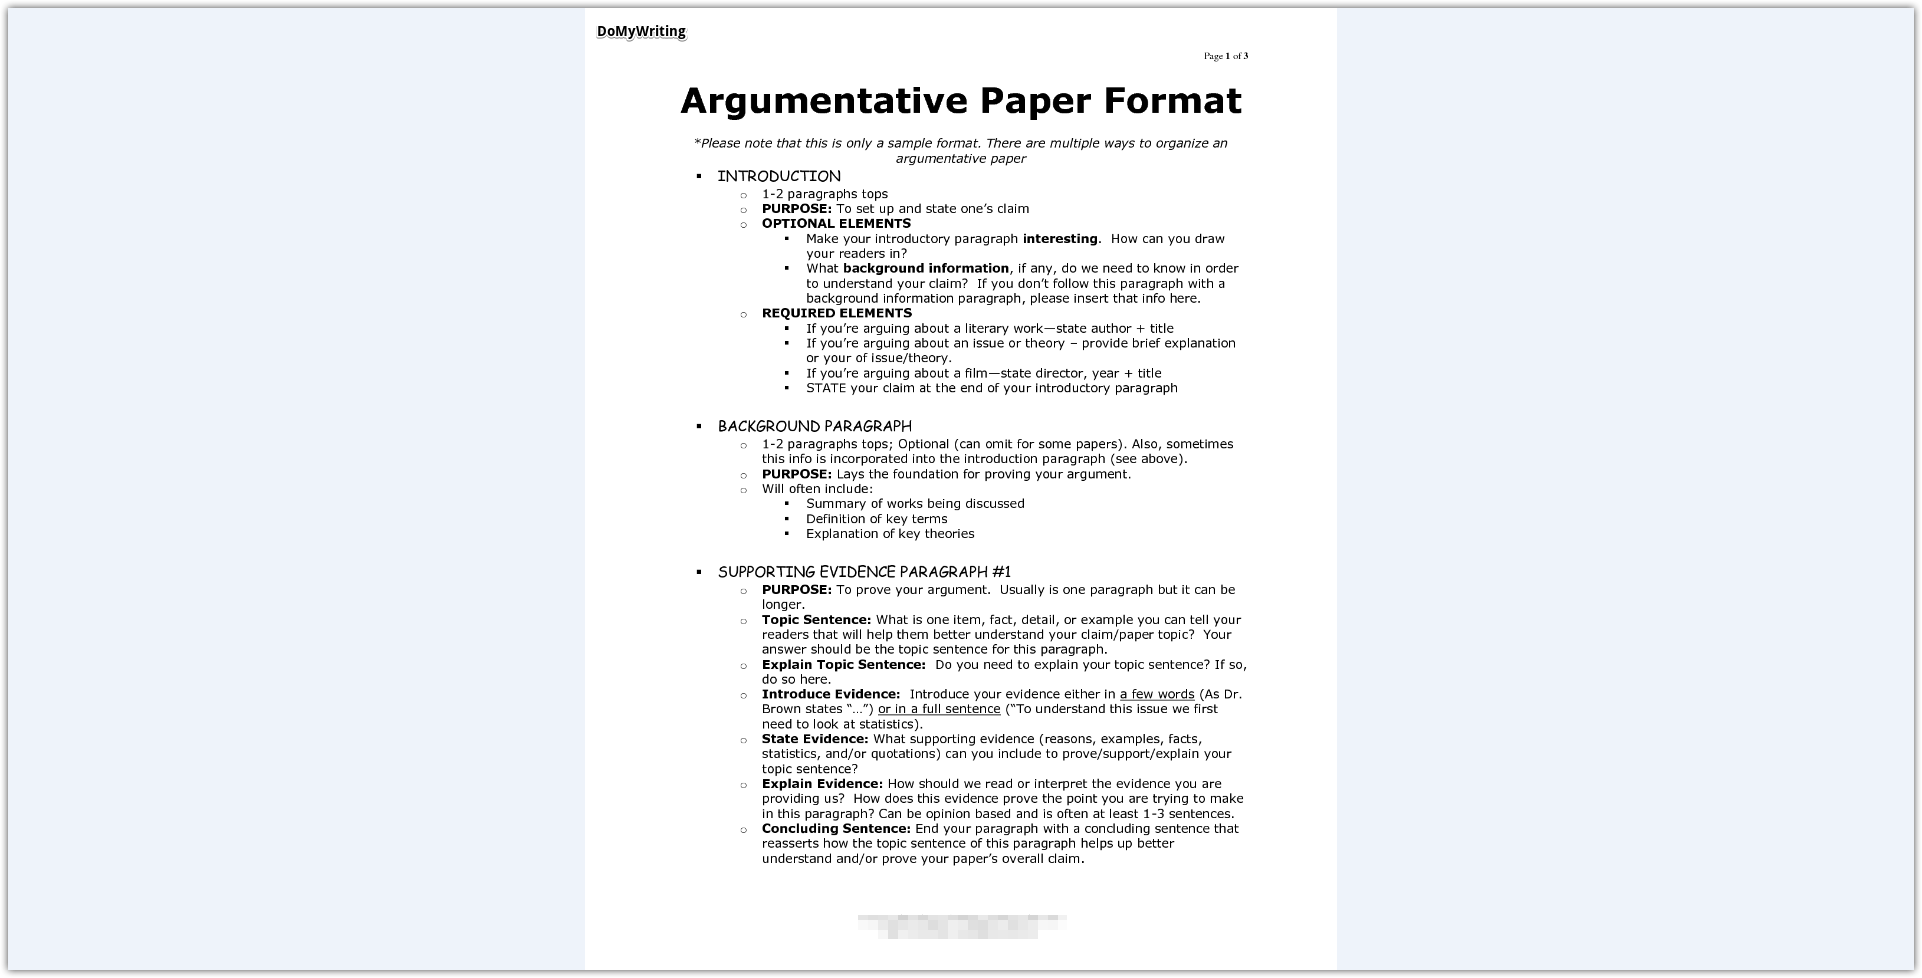 009 Essay Example Argumentative Format Controversial Excellent Topics Topic Ideas 2017 Music Full